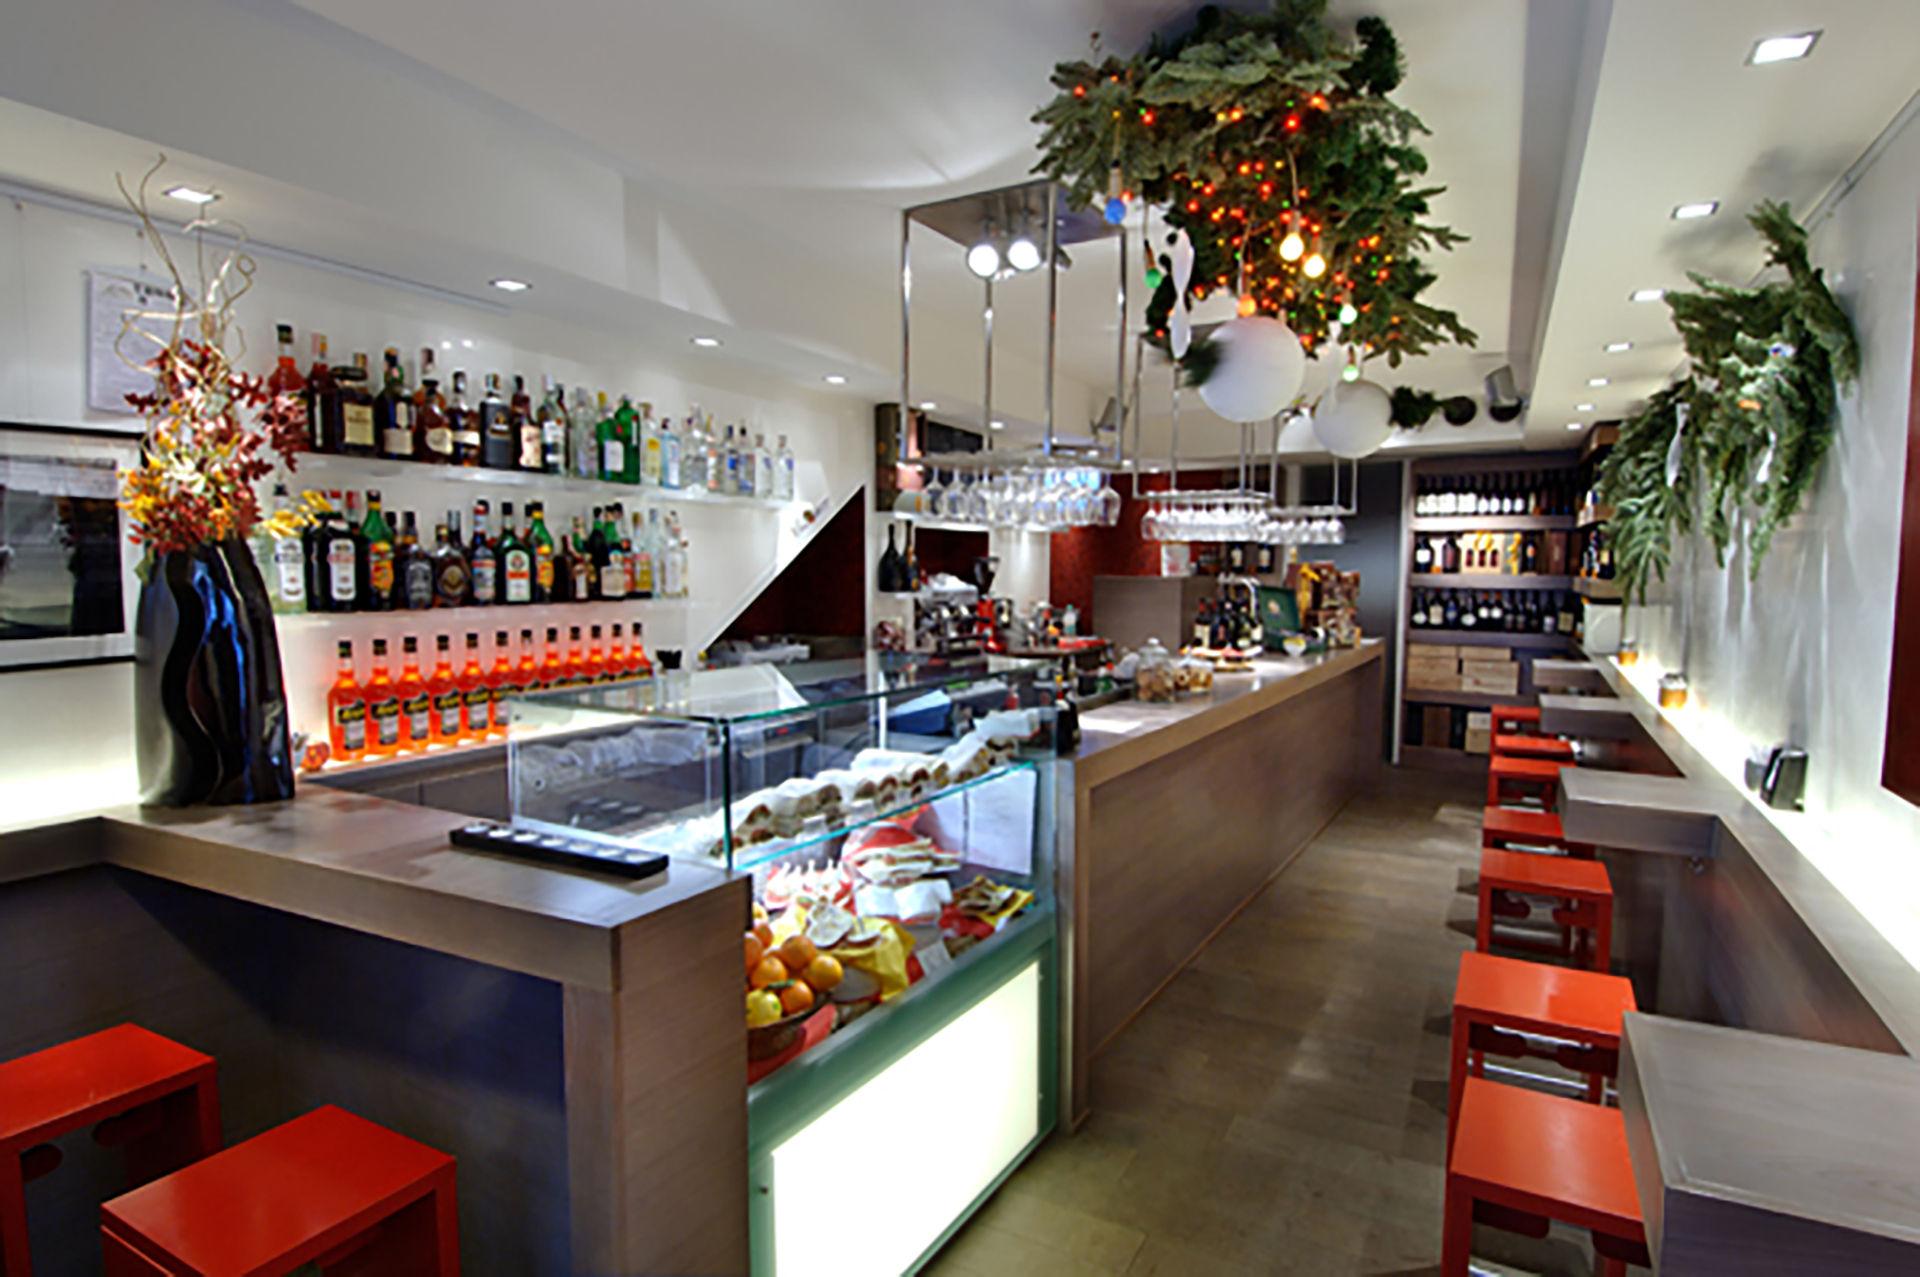 Agenzia d'Affari Wine Bar